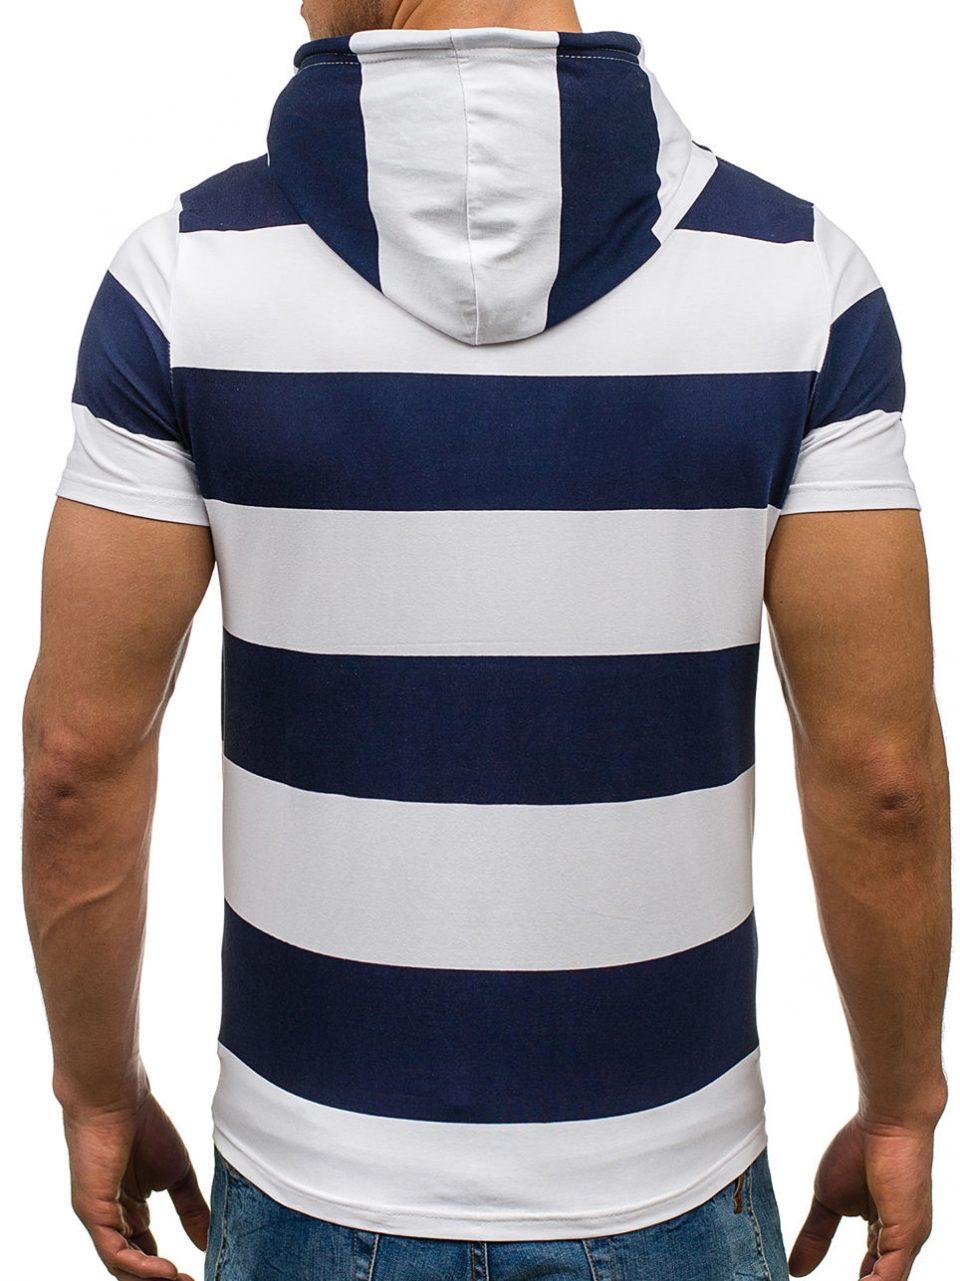 pol_pl_T-shirt-meski-z-nadrukiem-bialo-granatowa-Denley-X102-50522_4-960x1281.jpg